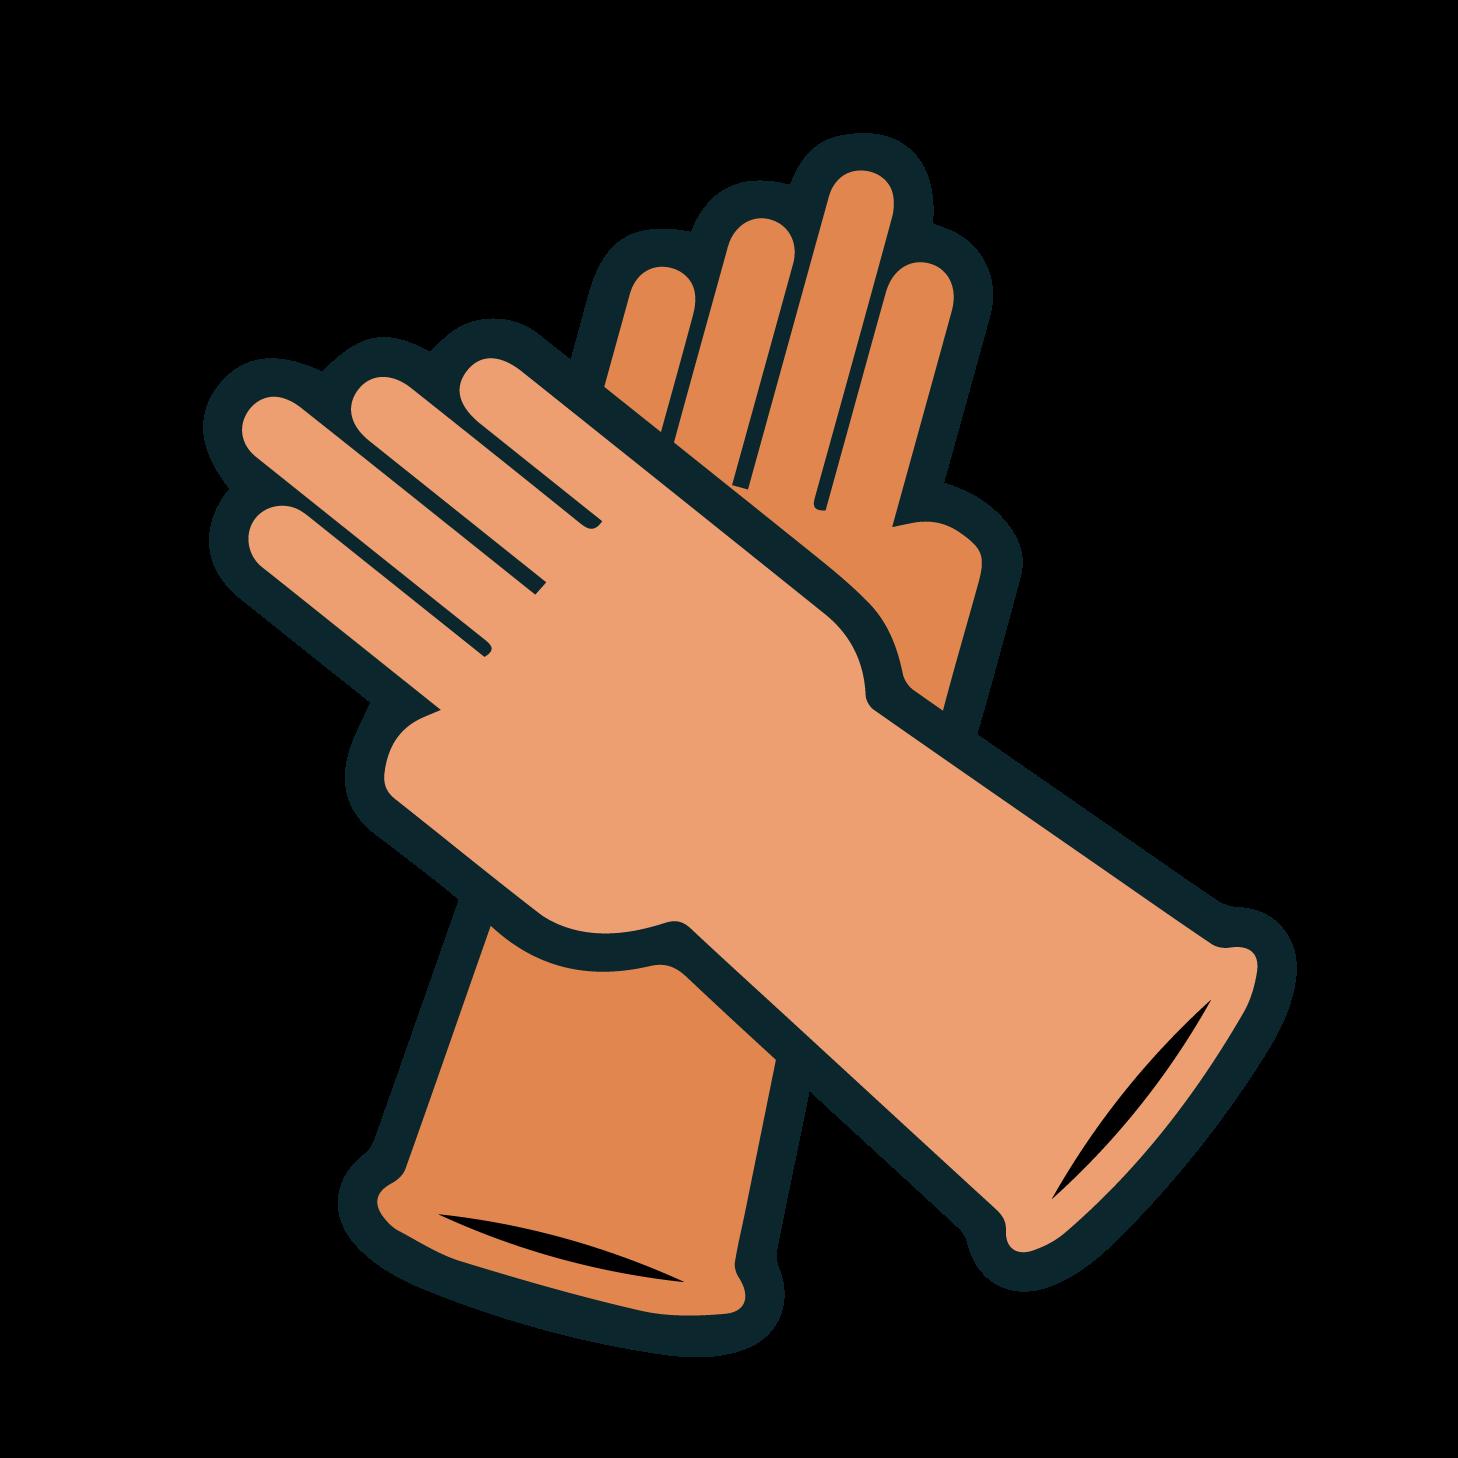 YOH_Illustrations_gloves